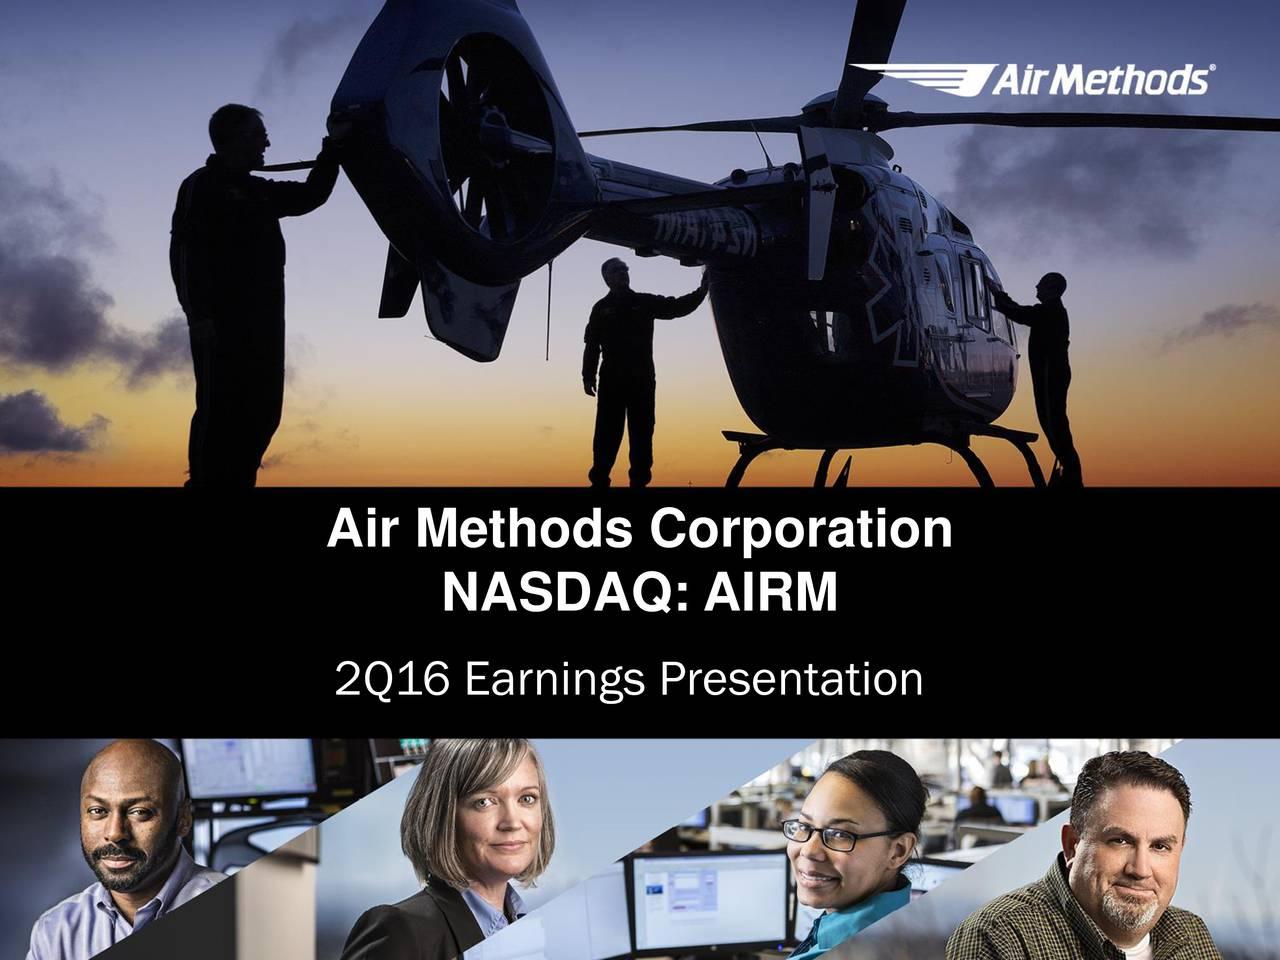 NASDAQ: AIRM 2Q16 Earnings Presentation